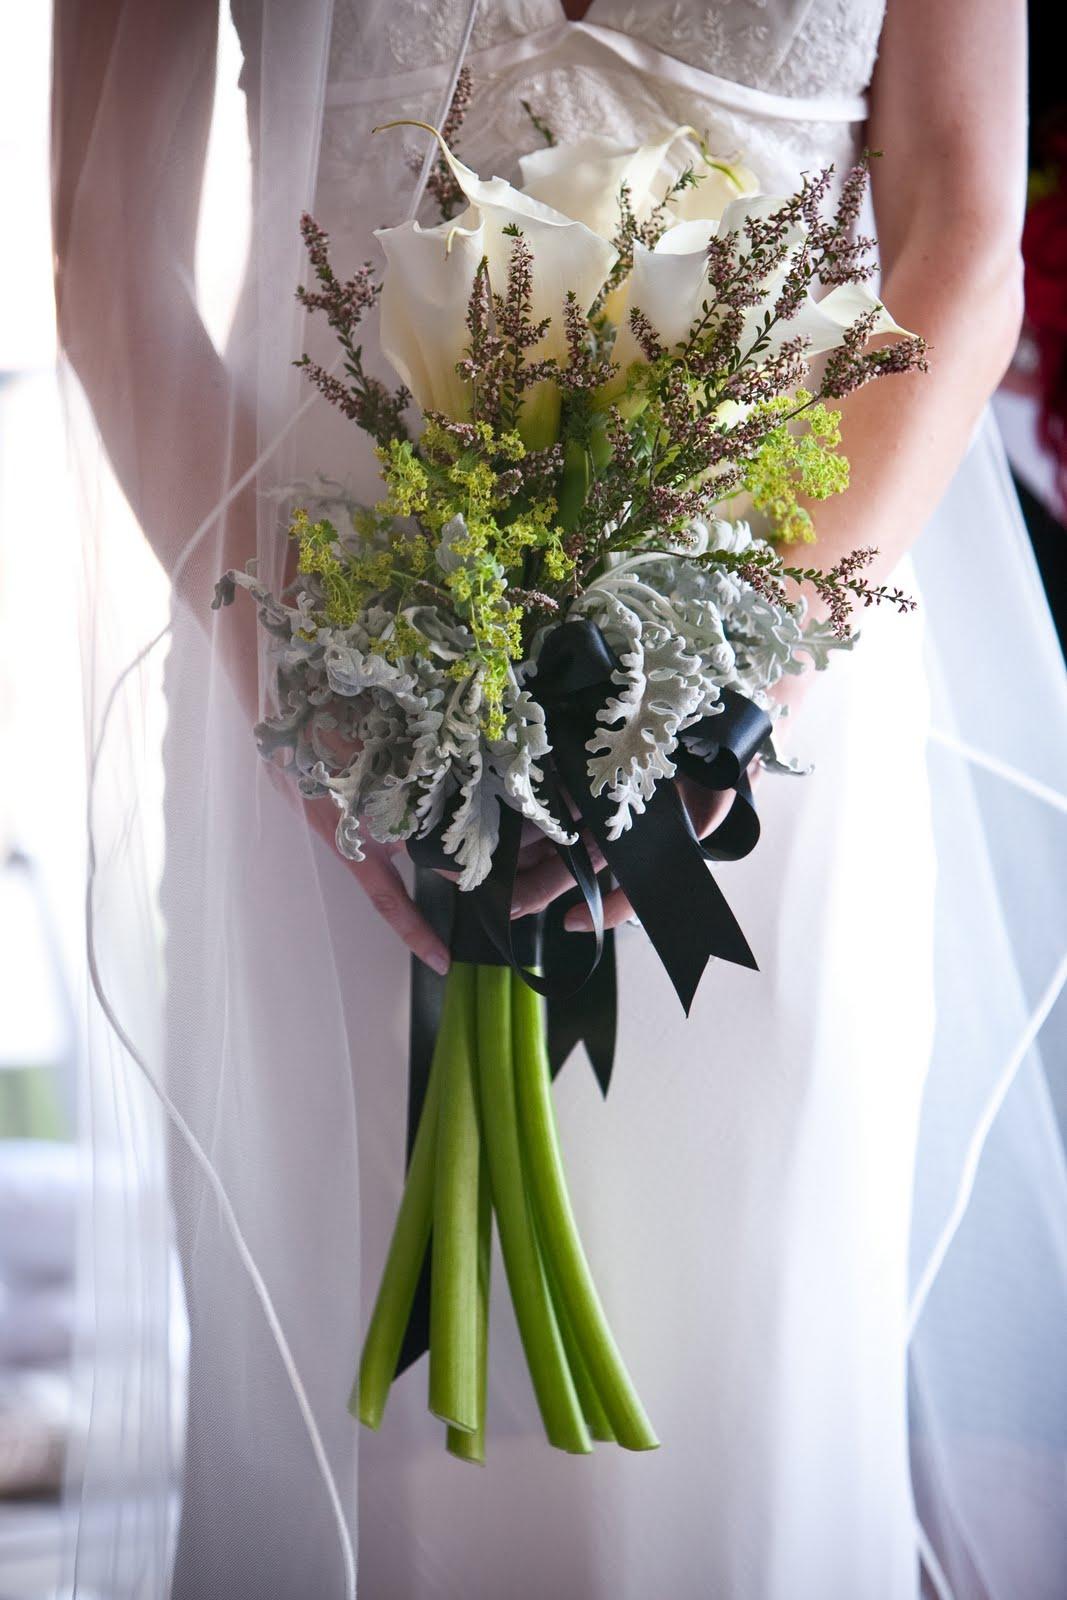 bouquets from real weddings martha stewart weddings weddings style ...